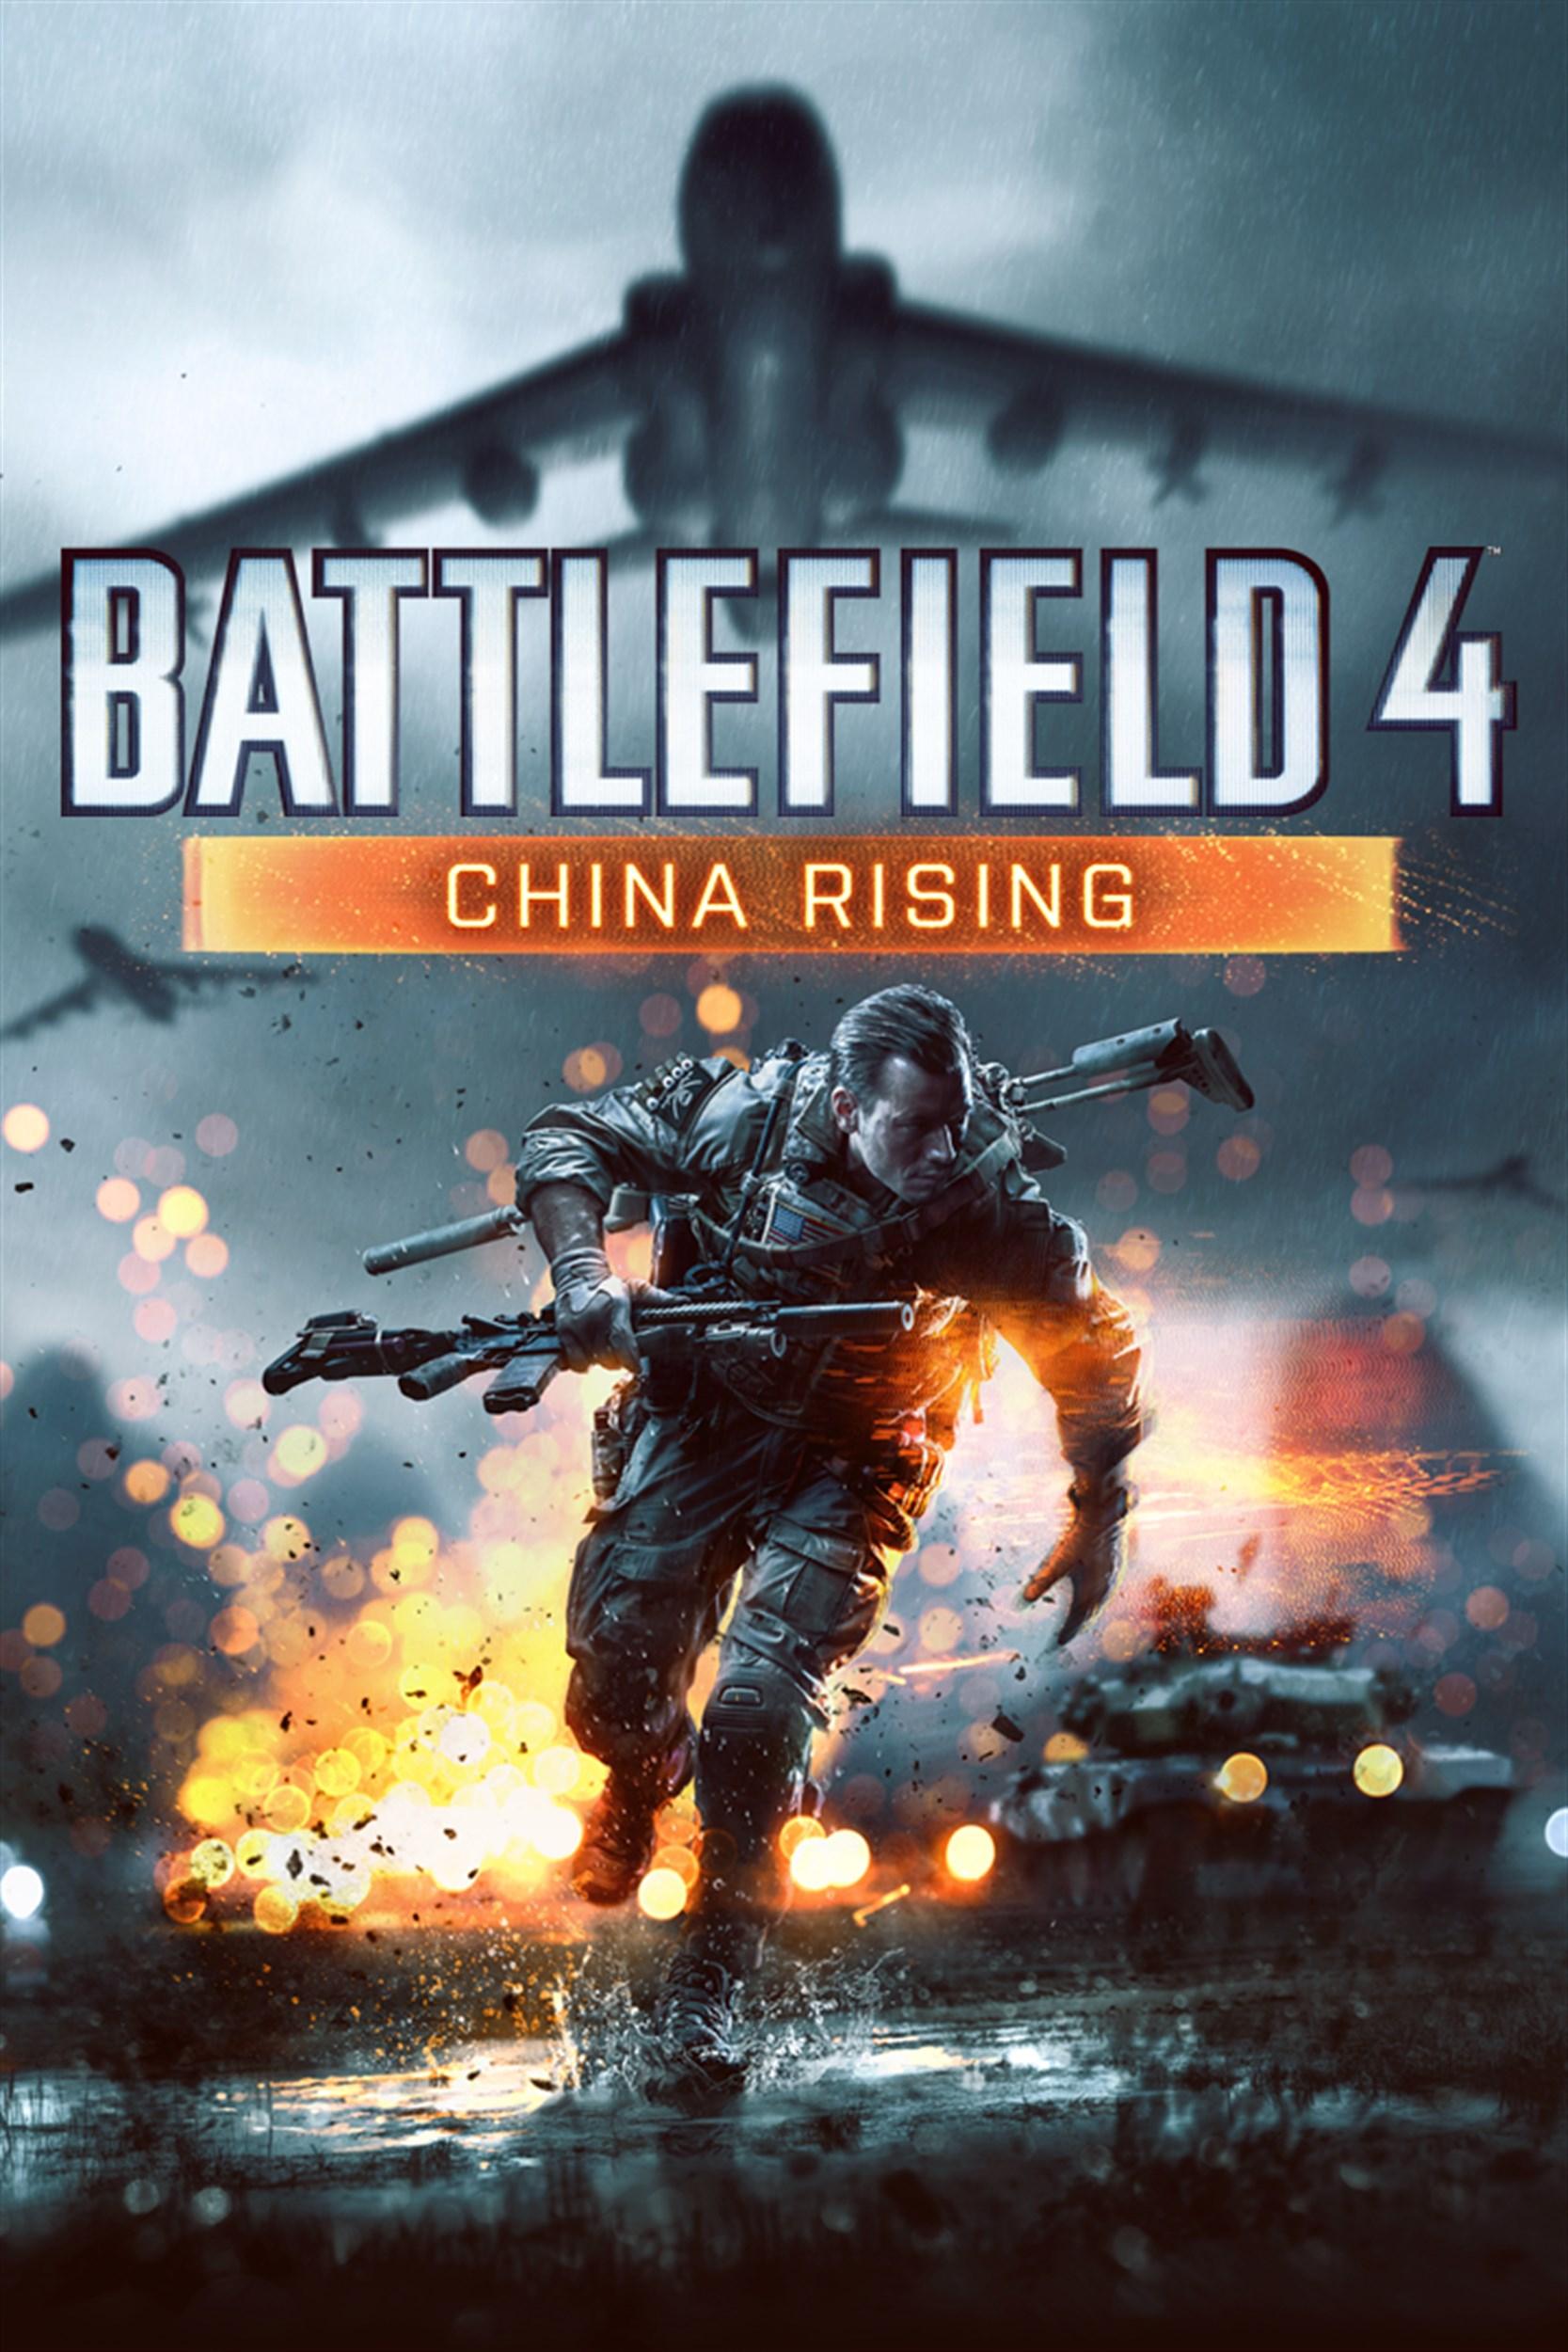 (Xbox One) Battlefield 4 - China Rising DLC